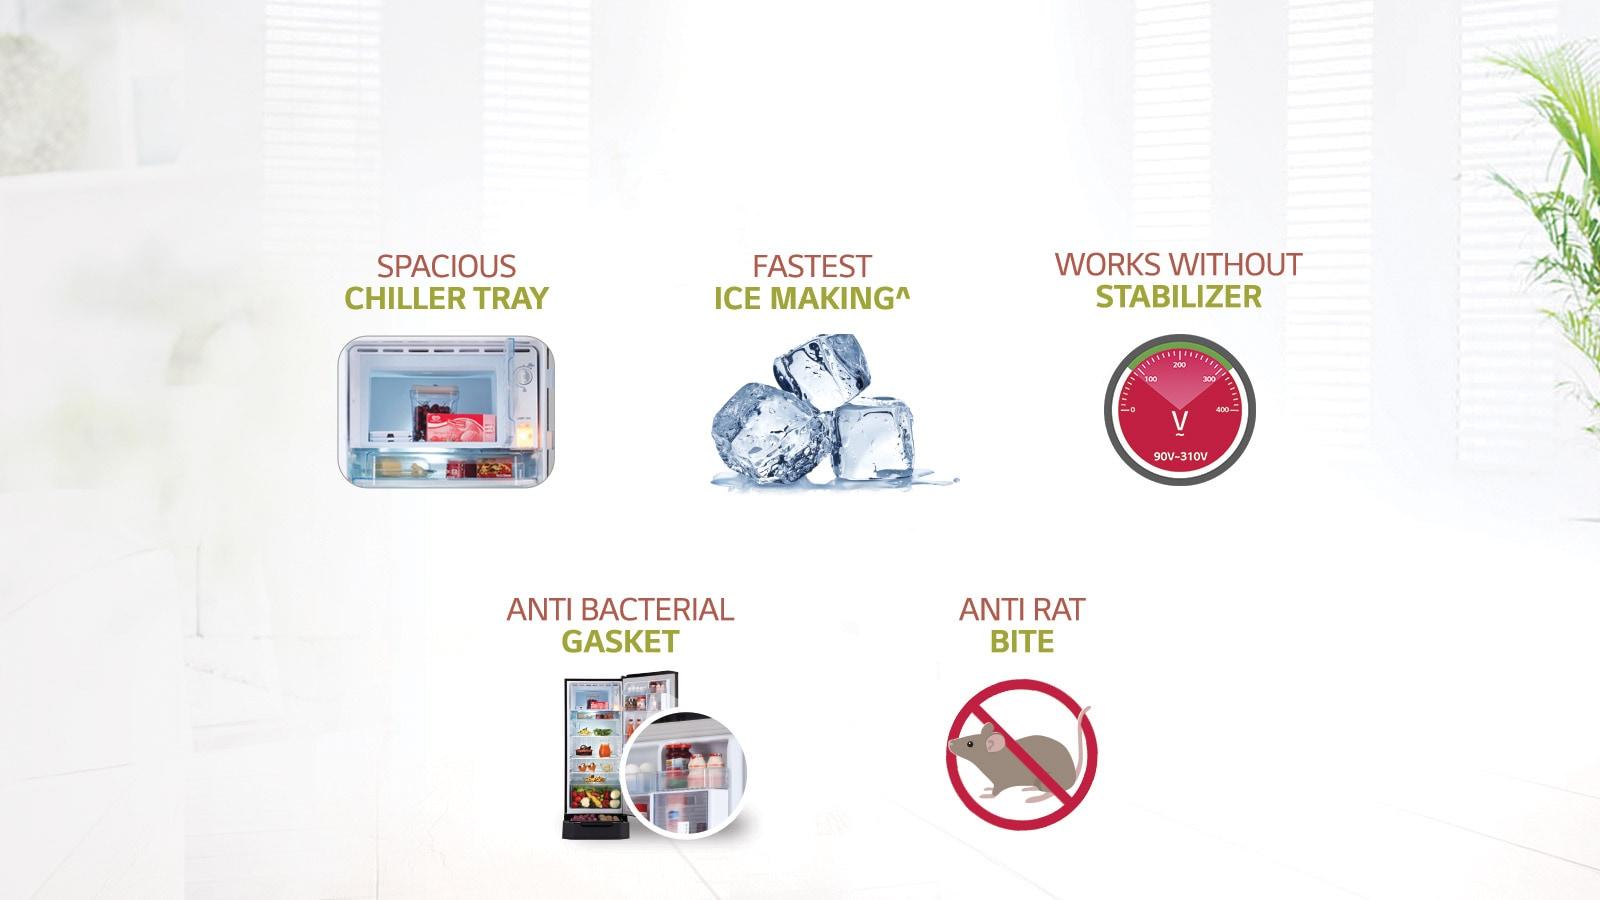 LG Single Door Refrigerator Other Key Features